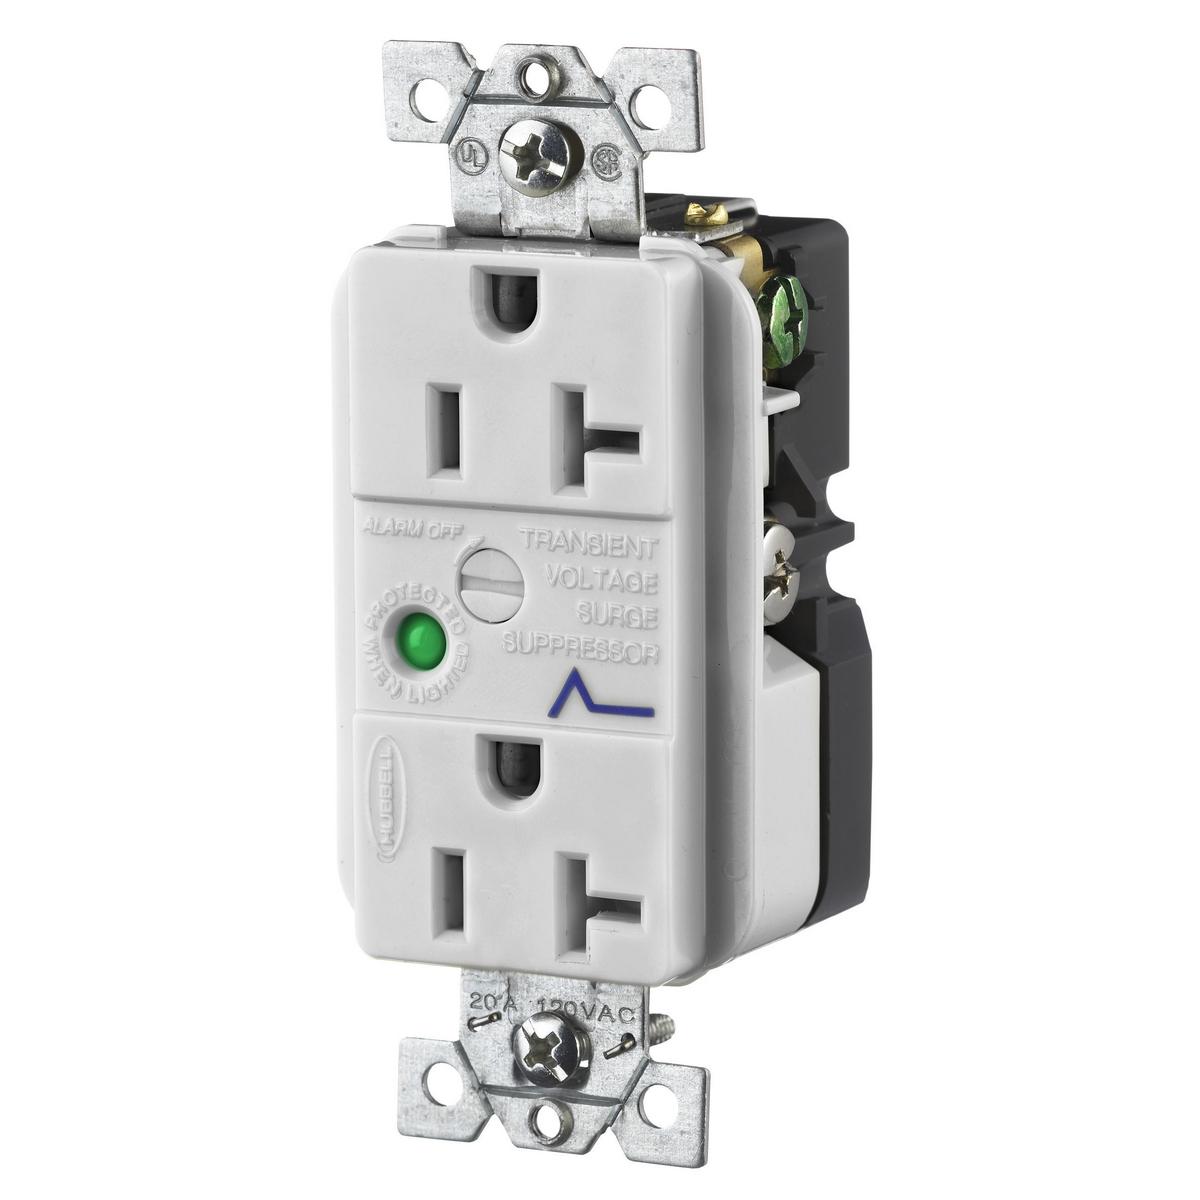 Hubbell HBL5360OWSA 20 Amp 125 Volt 2-Pole 3-Wire NEMA 5-20R Office White Duplex Surge Suppression Receptacle